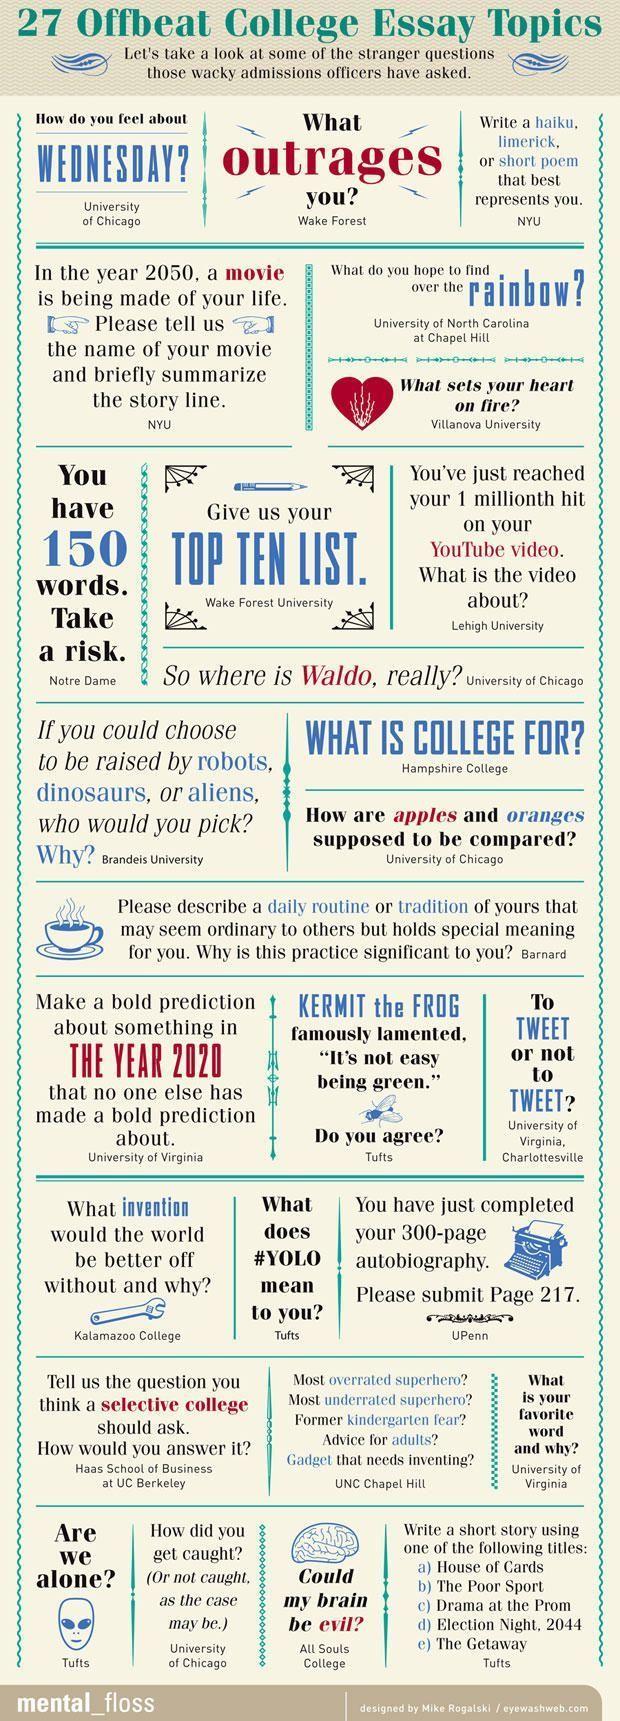 Essay topics for high school english